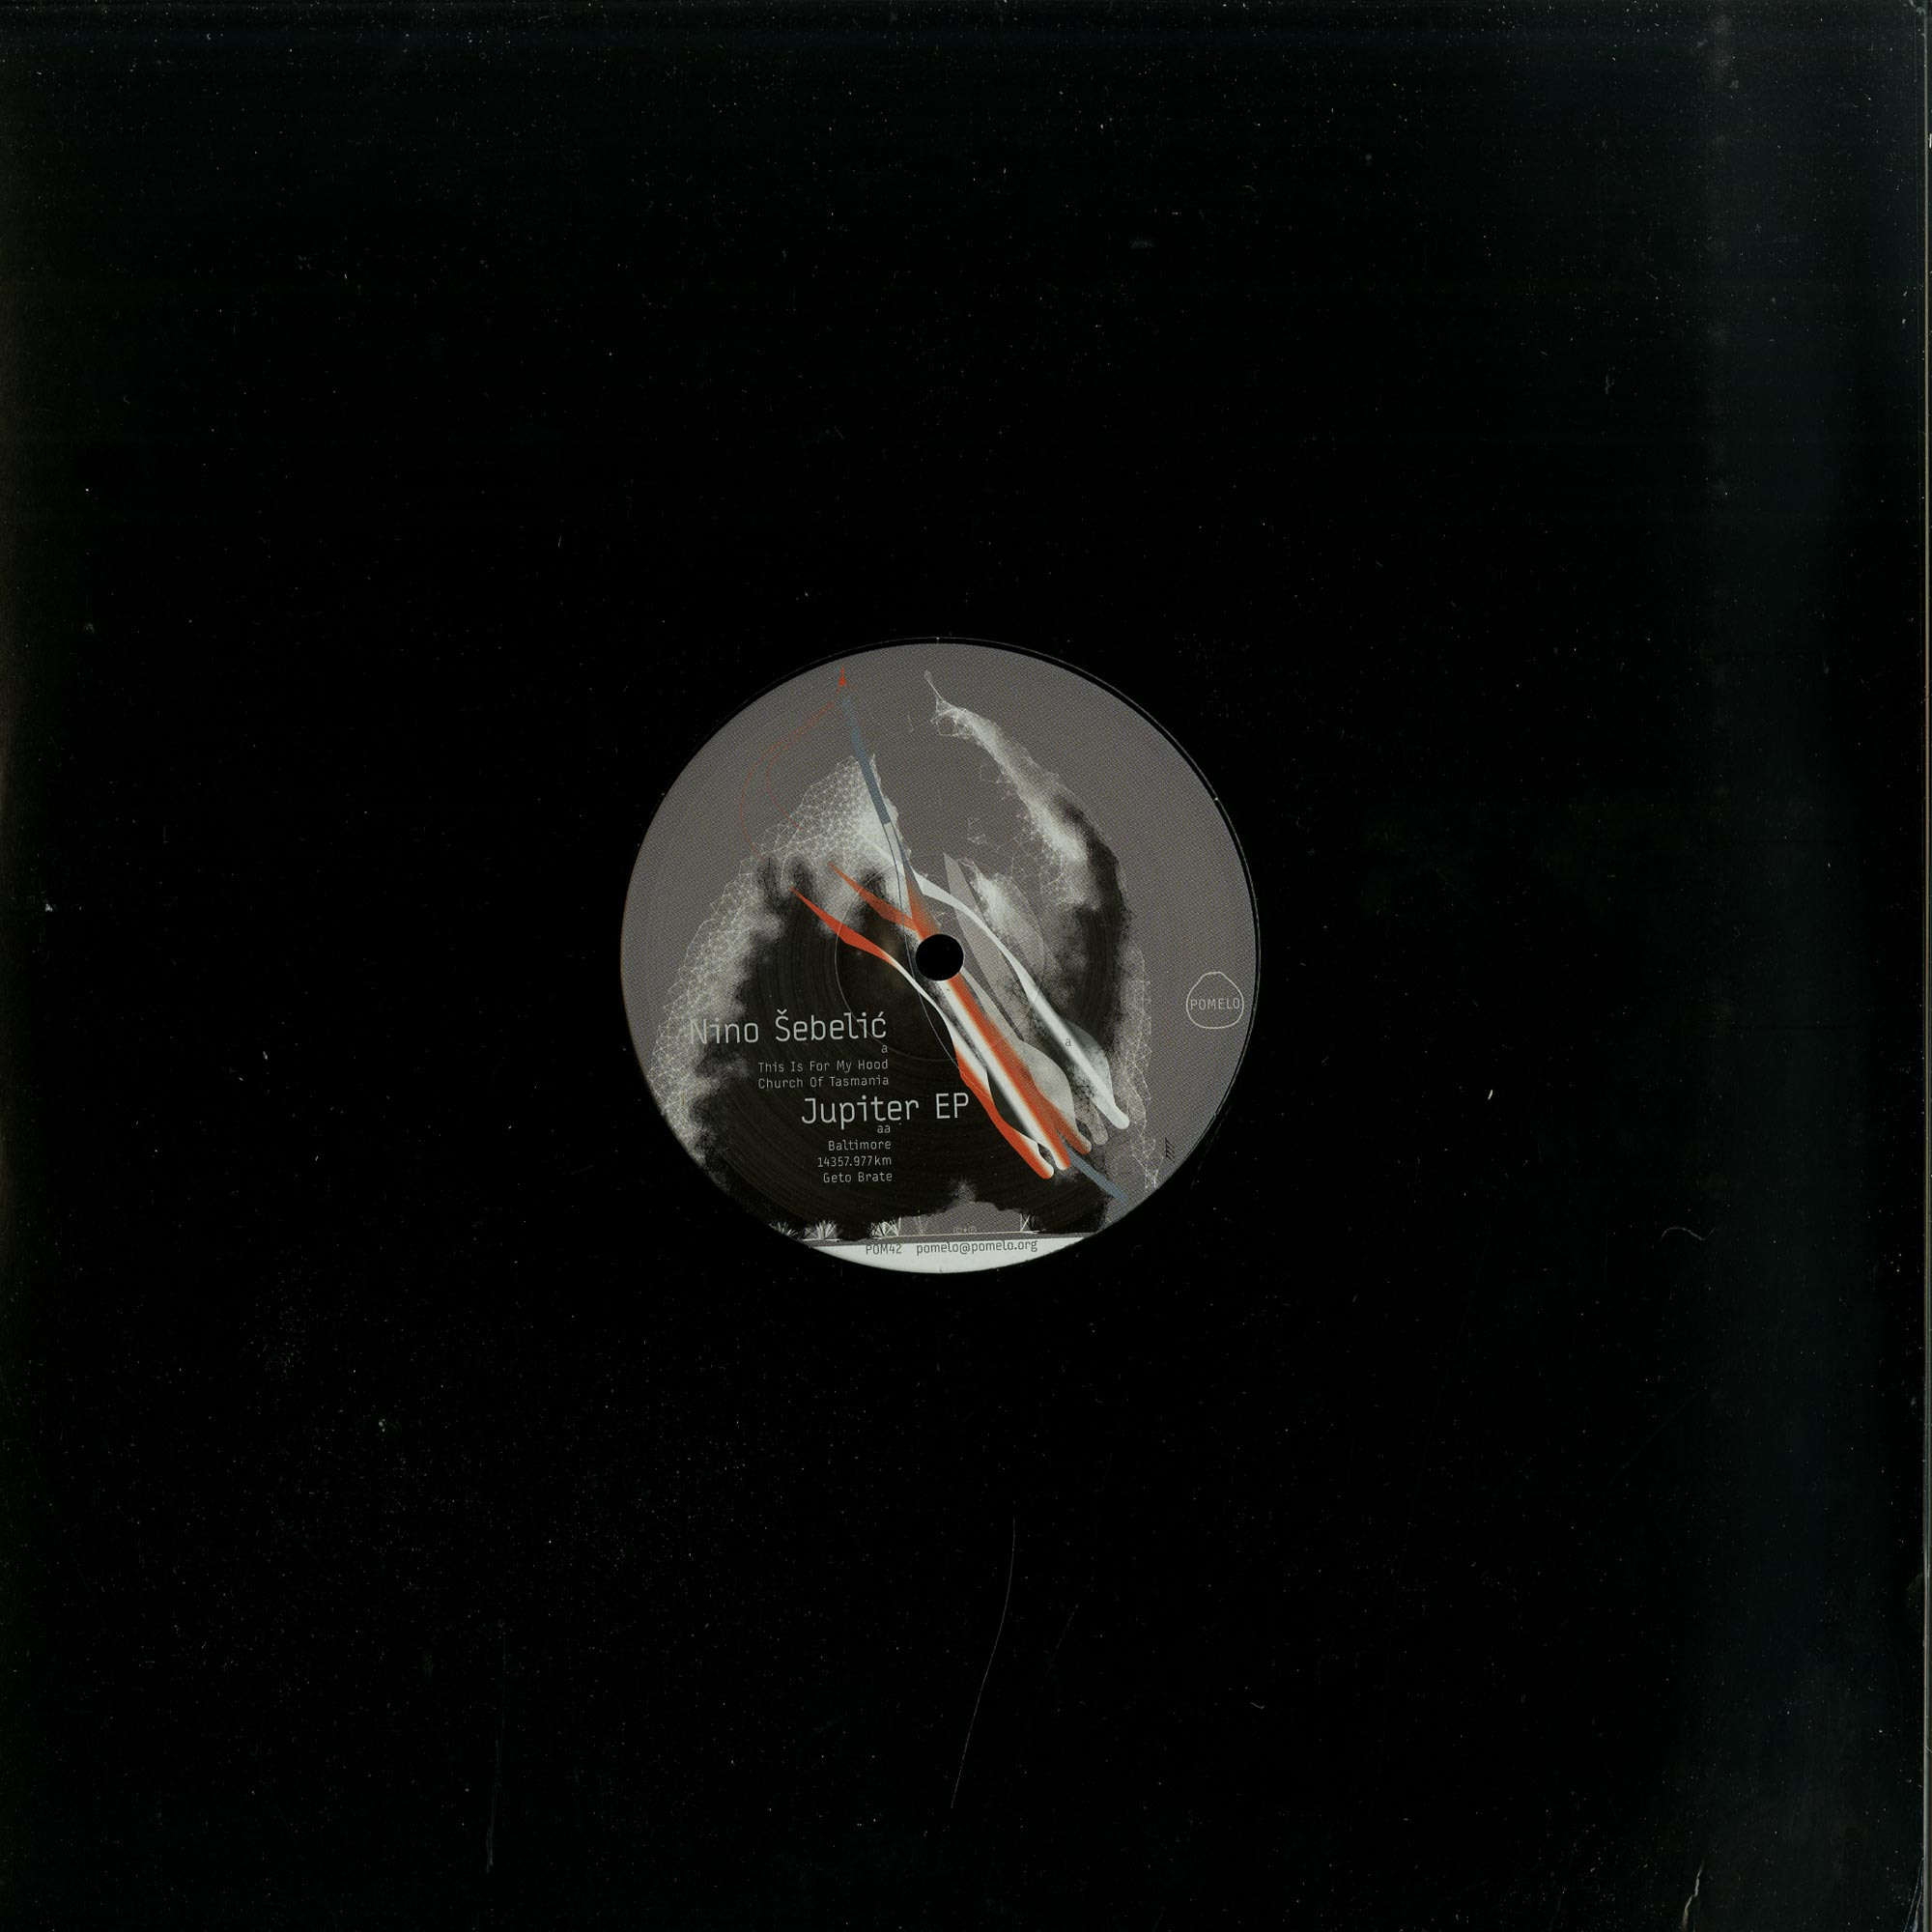 Nino Sebelic - JUPITER EP